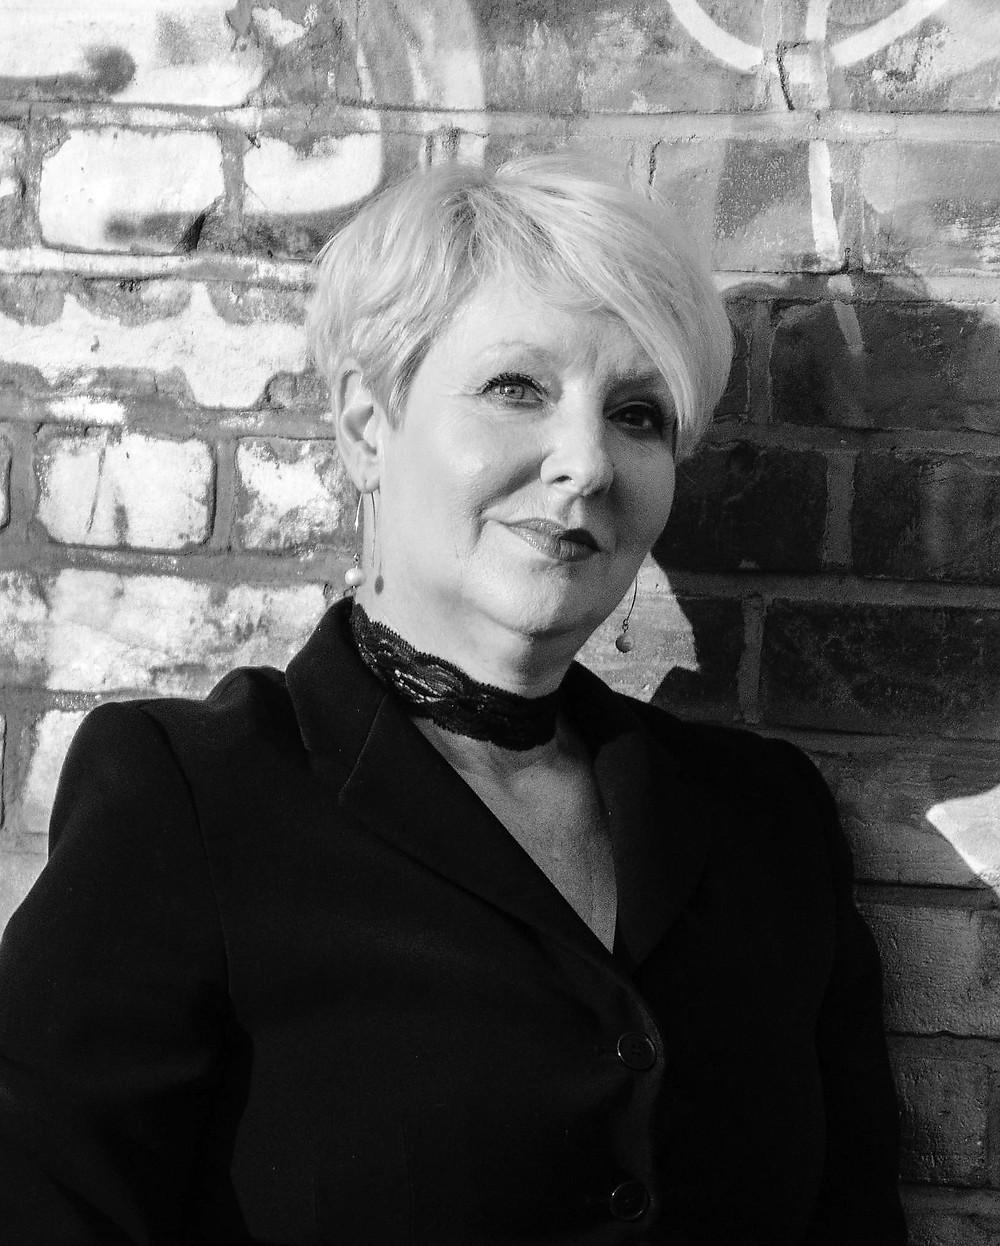 Vicky Newham, The Riff Raff